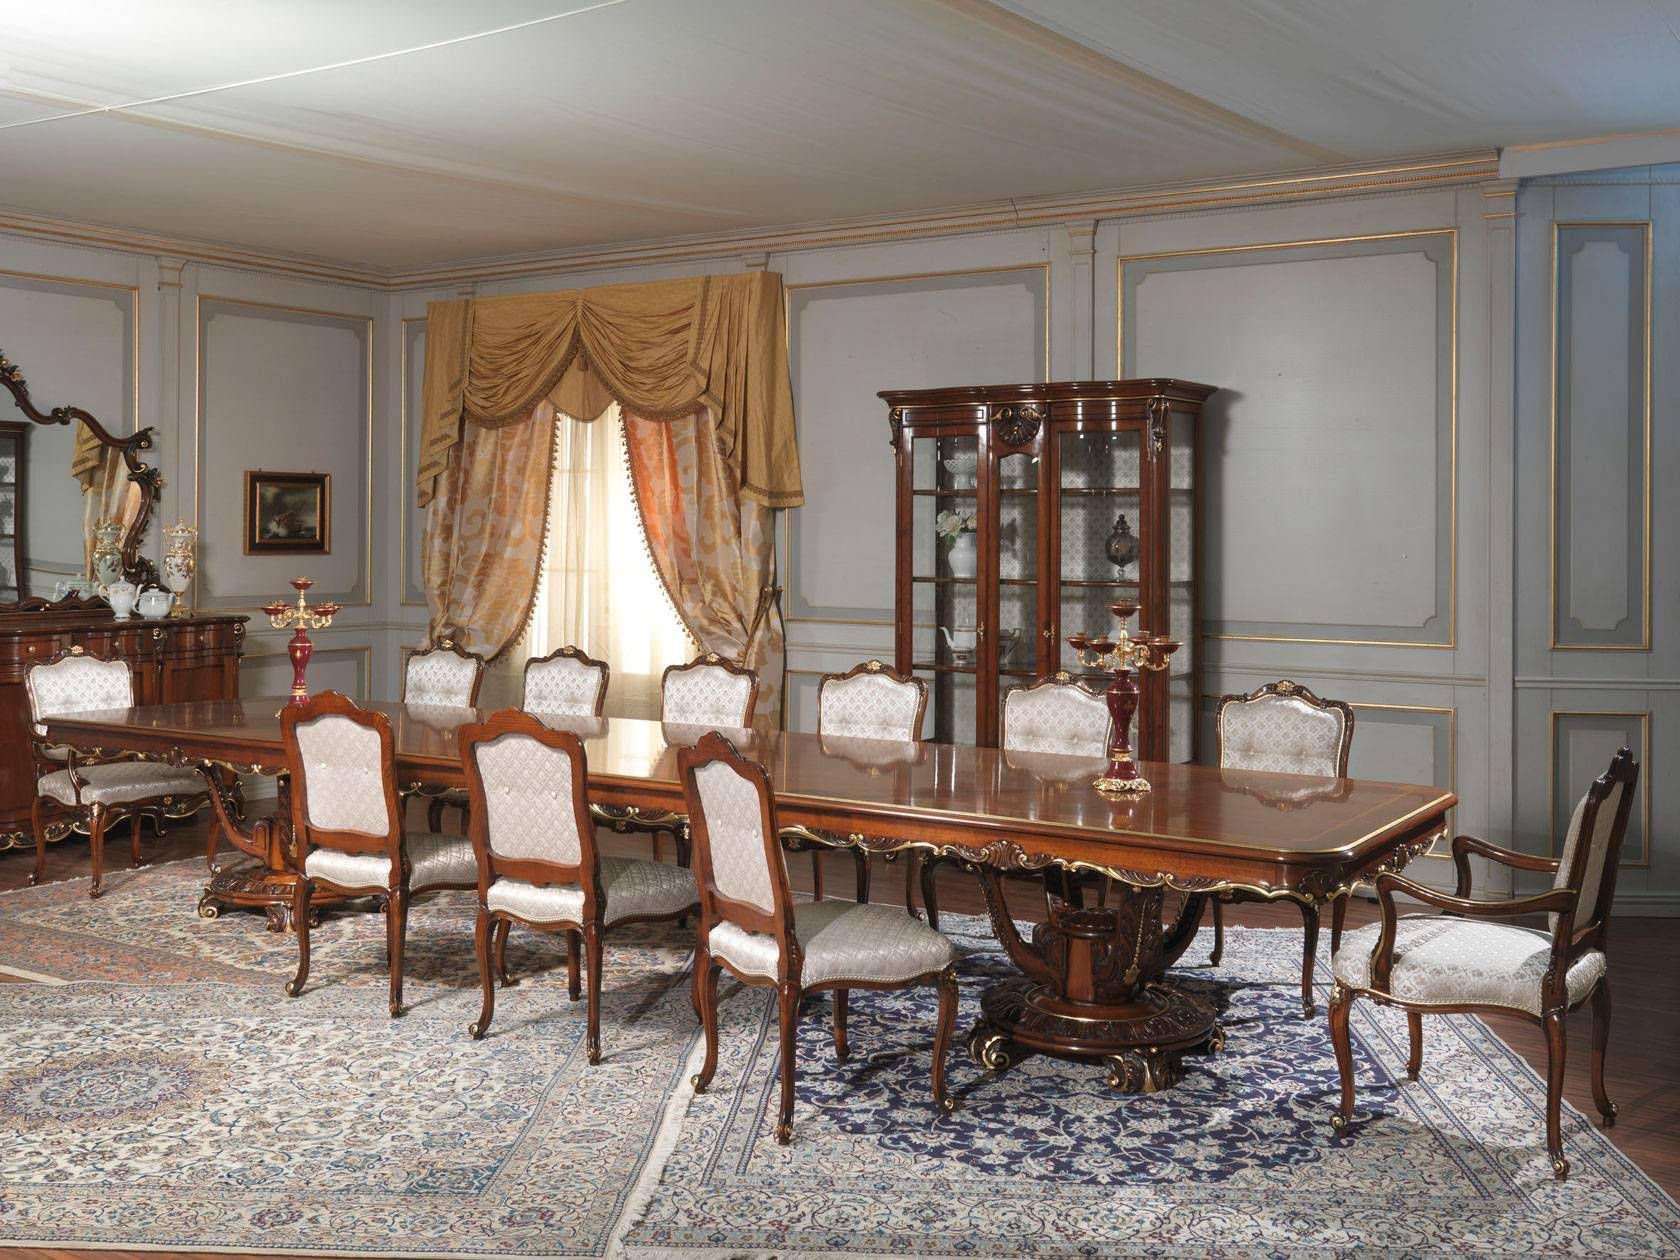 Tisch Louis Xv Stil Louis Xv Vimercati Meda Luxury Classic Furniture Holz Rechteckig